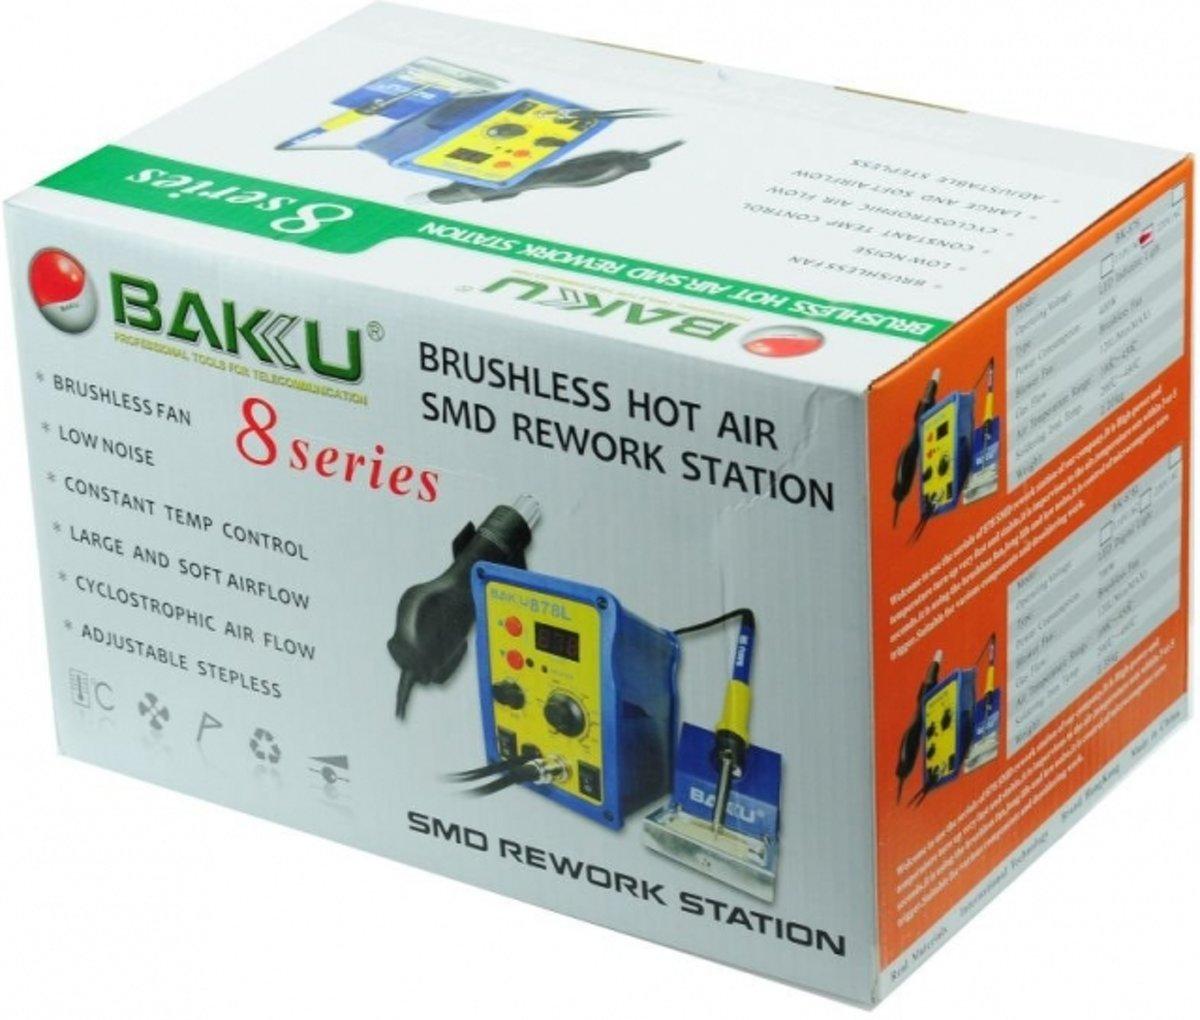 400W Hete Lucht SMD Rework Soldeer Station - Baku 878 L kopen